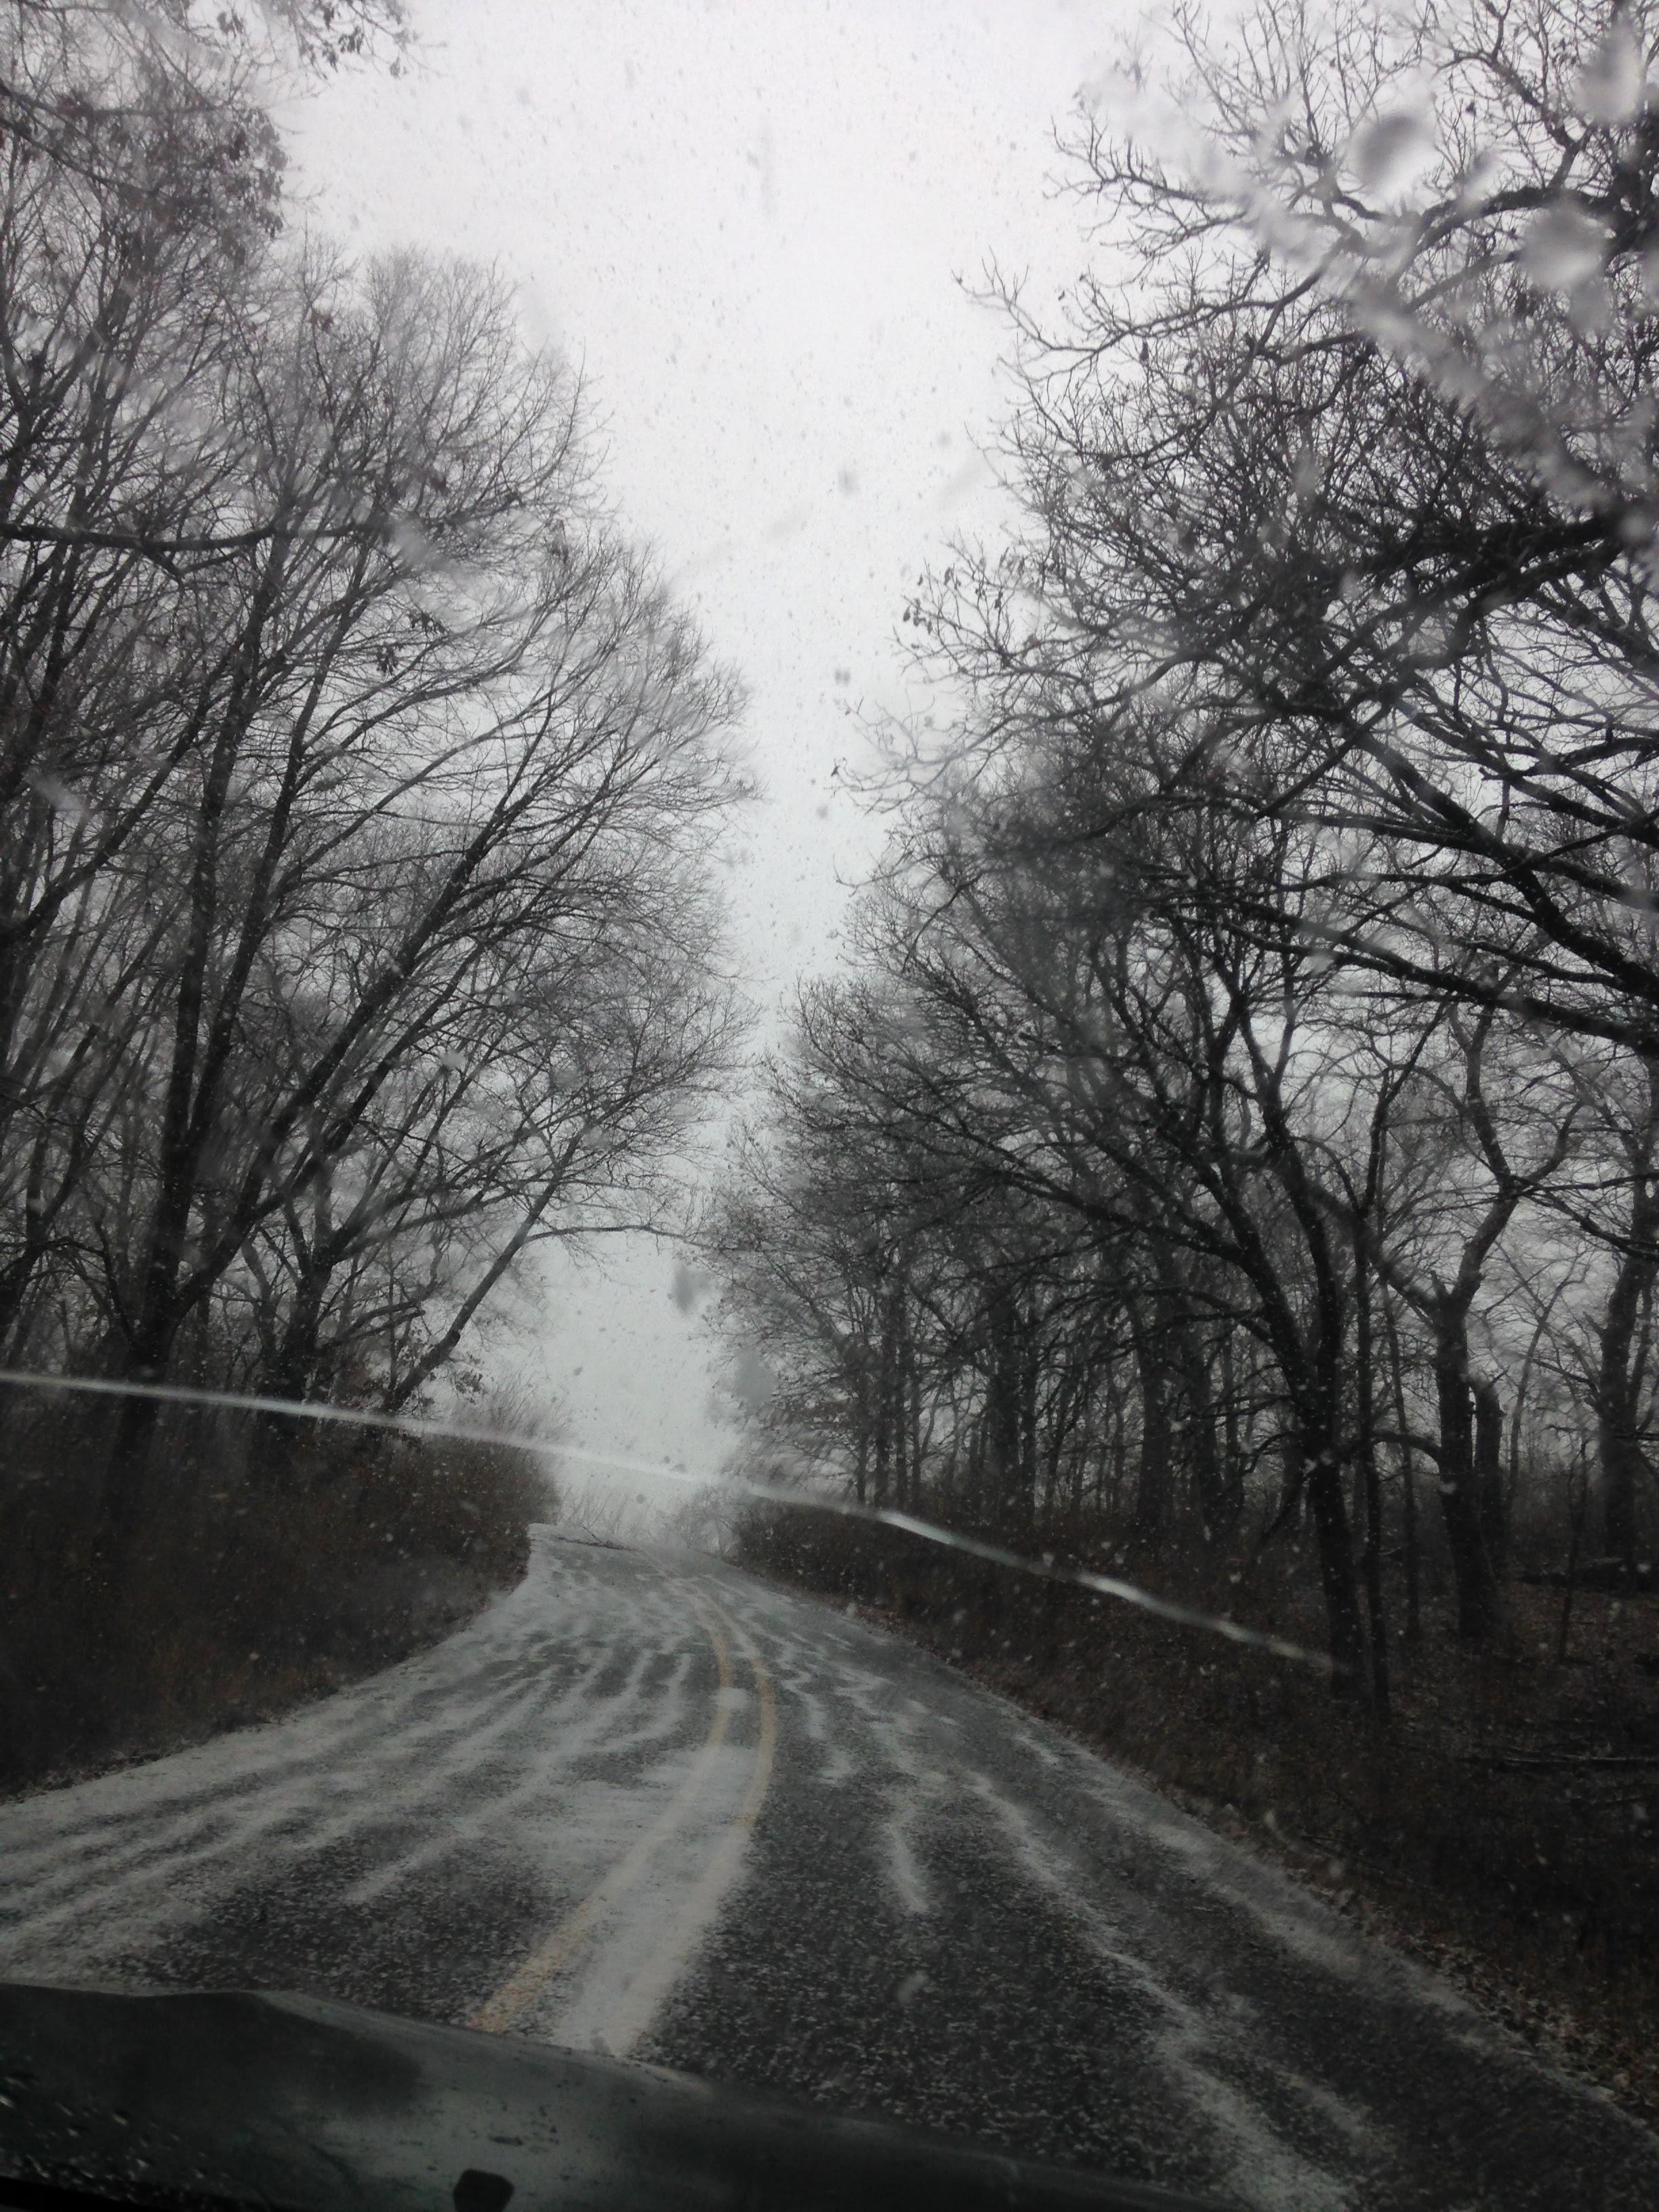 Gloomy-Snowy-Day.jpg